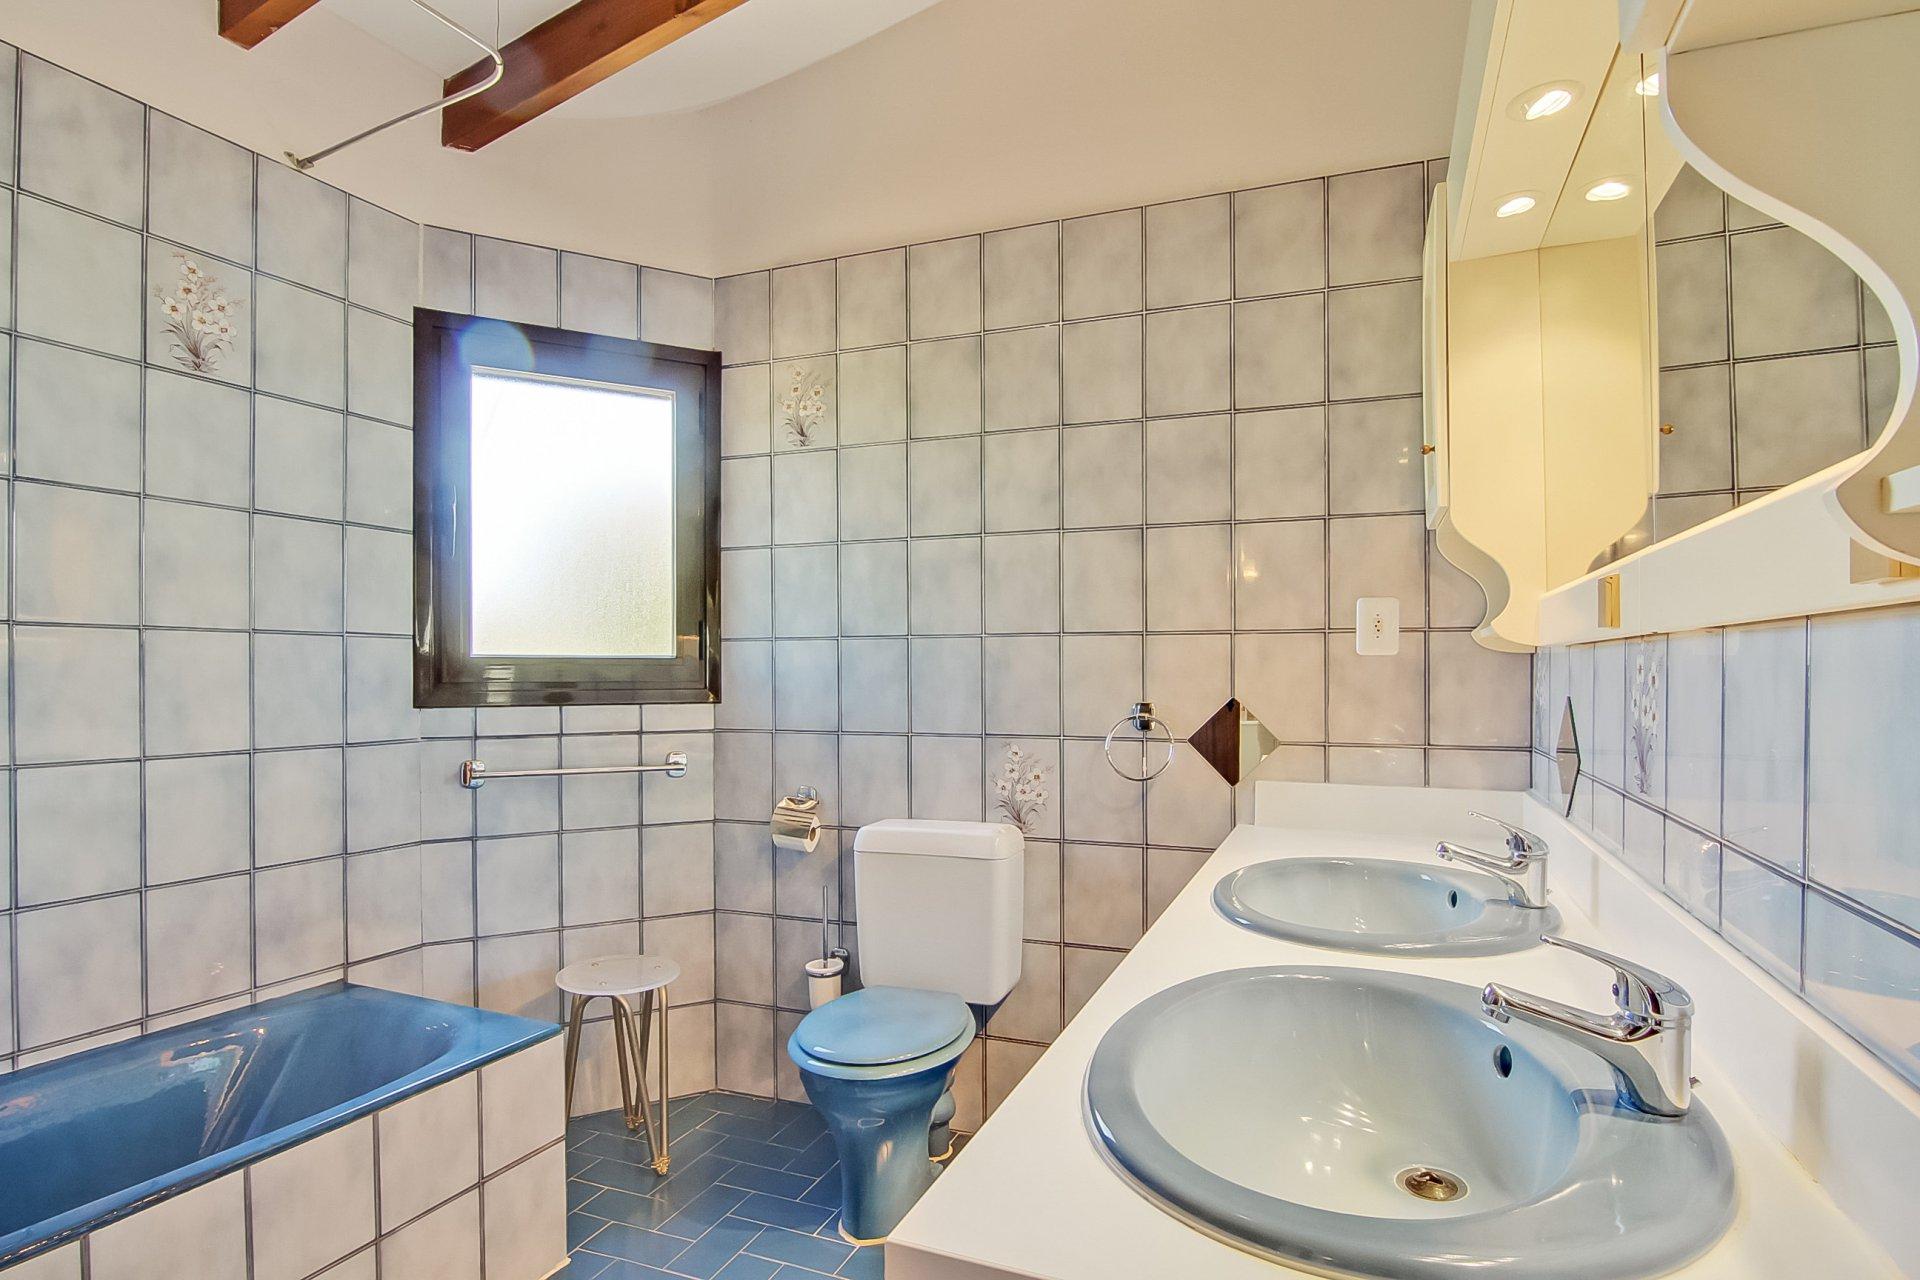 5-bedroom villa in Calpe